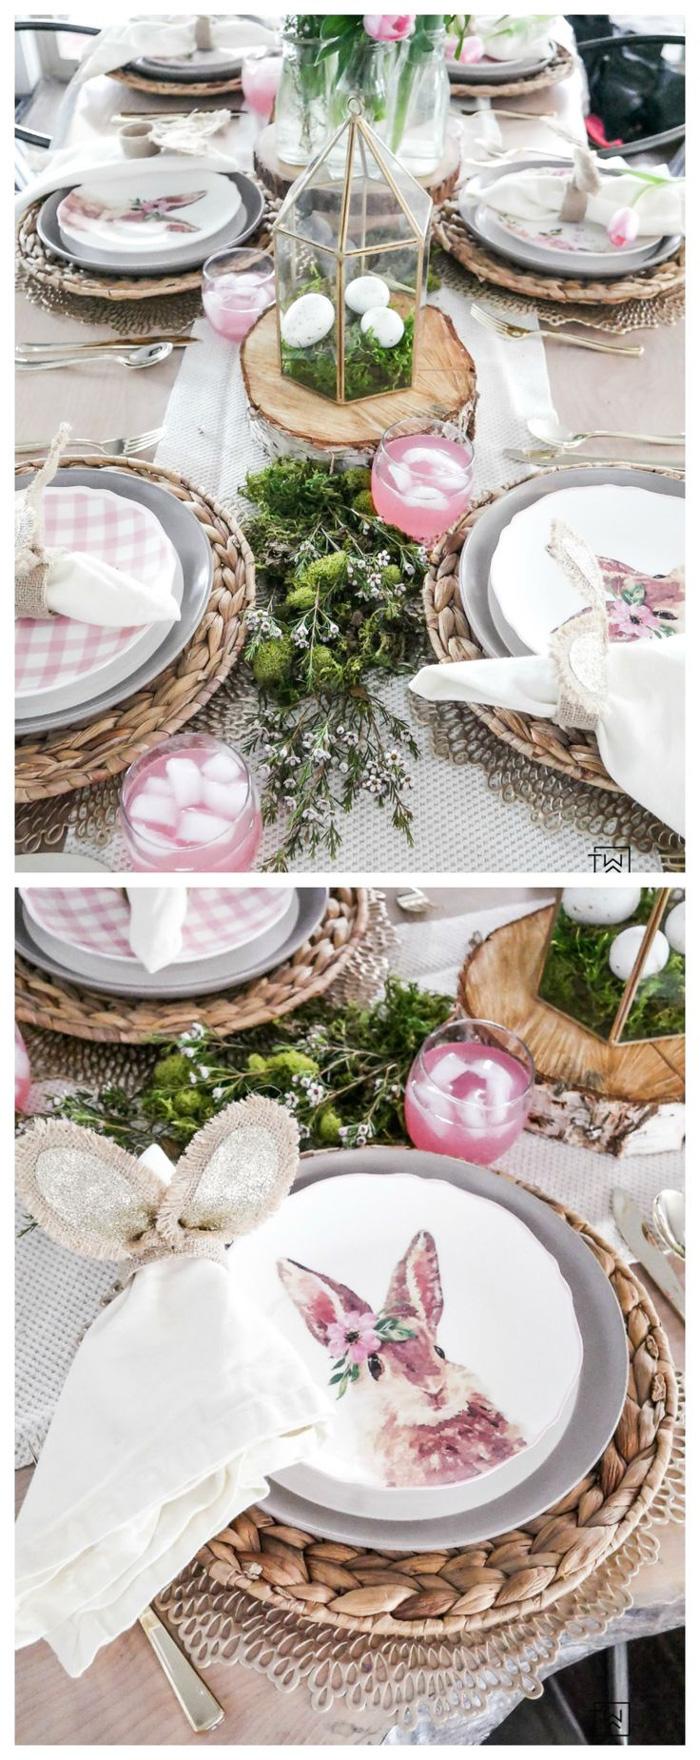 Easter-Table-Decoration-Ideas-Handmade-Centerpiece